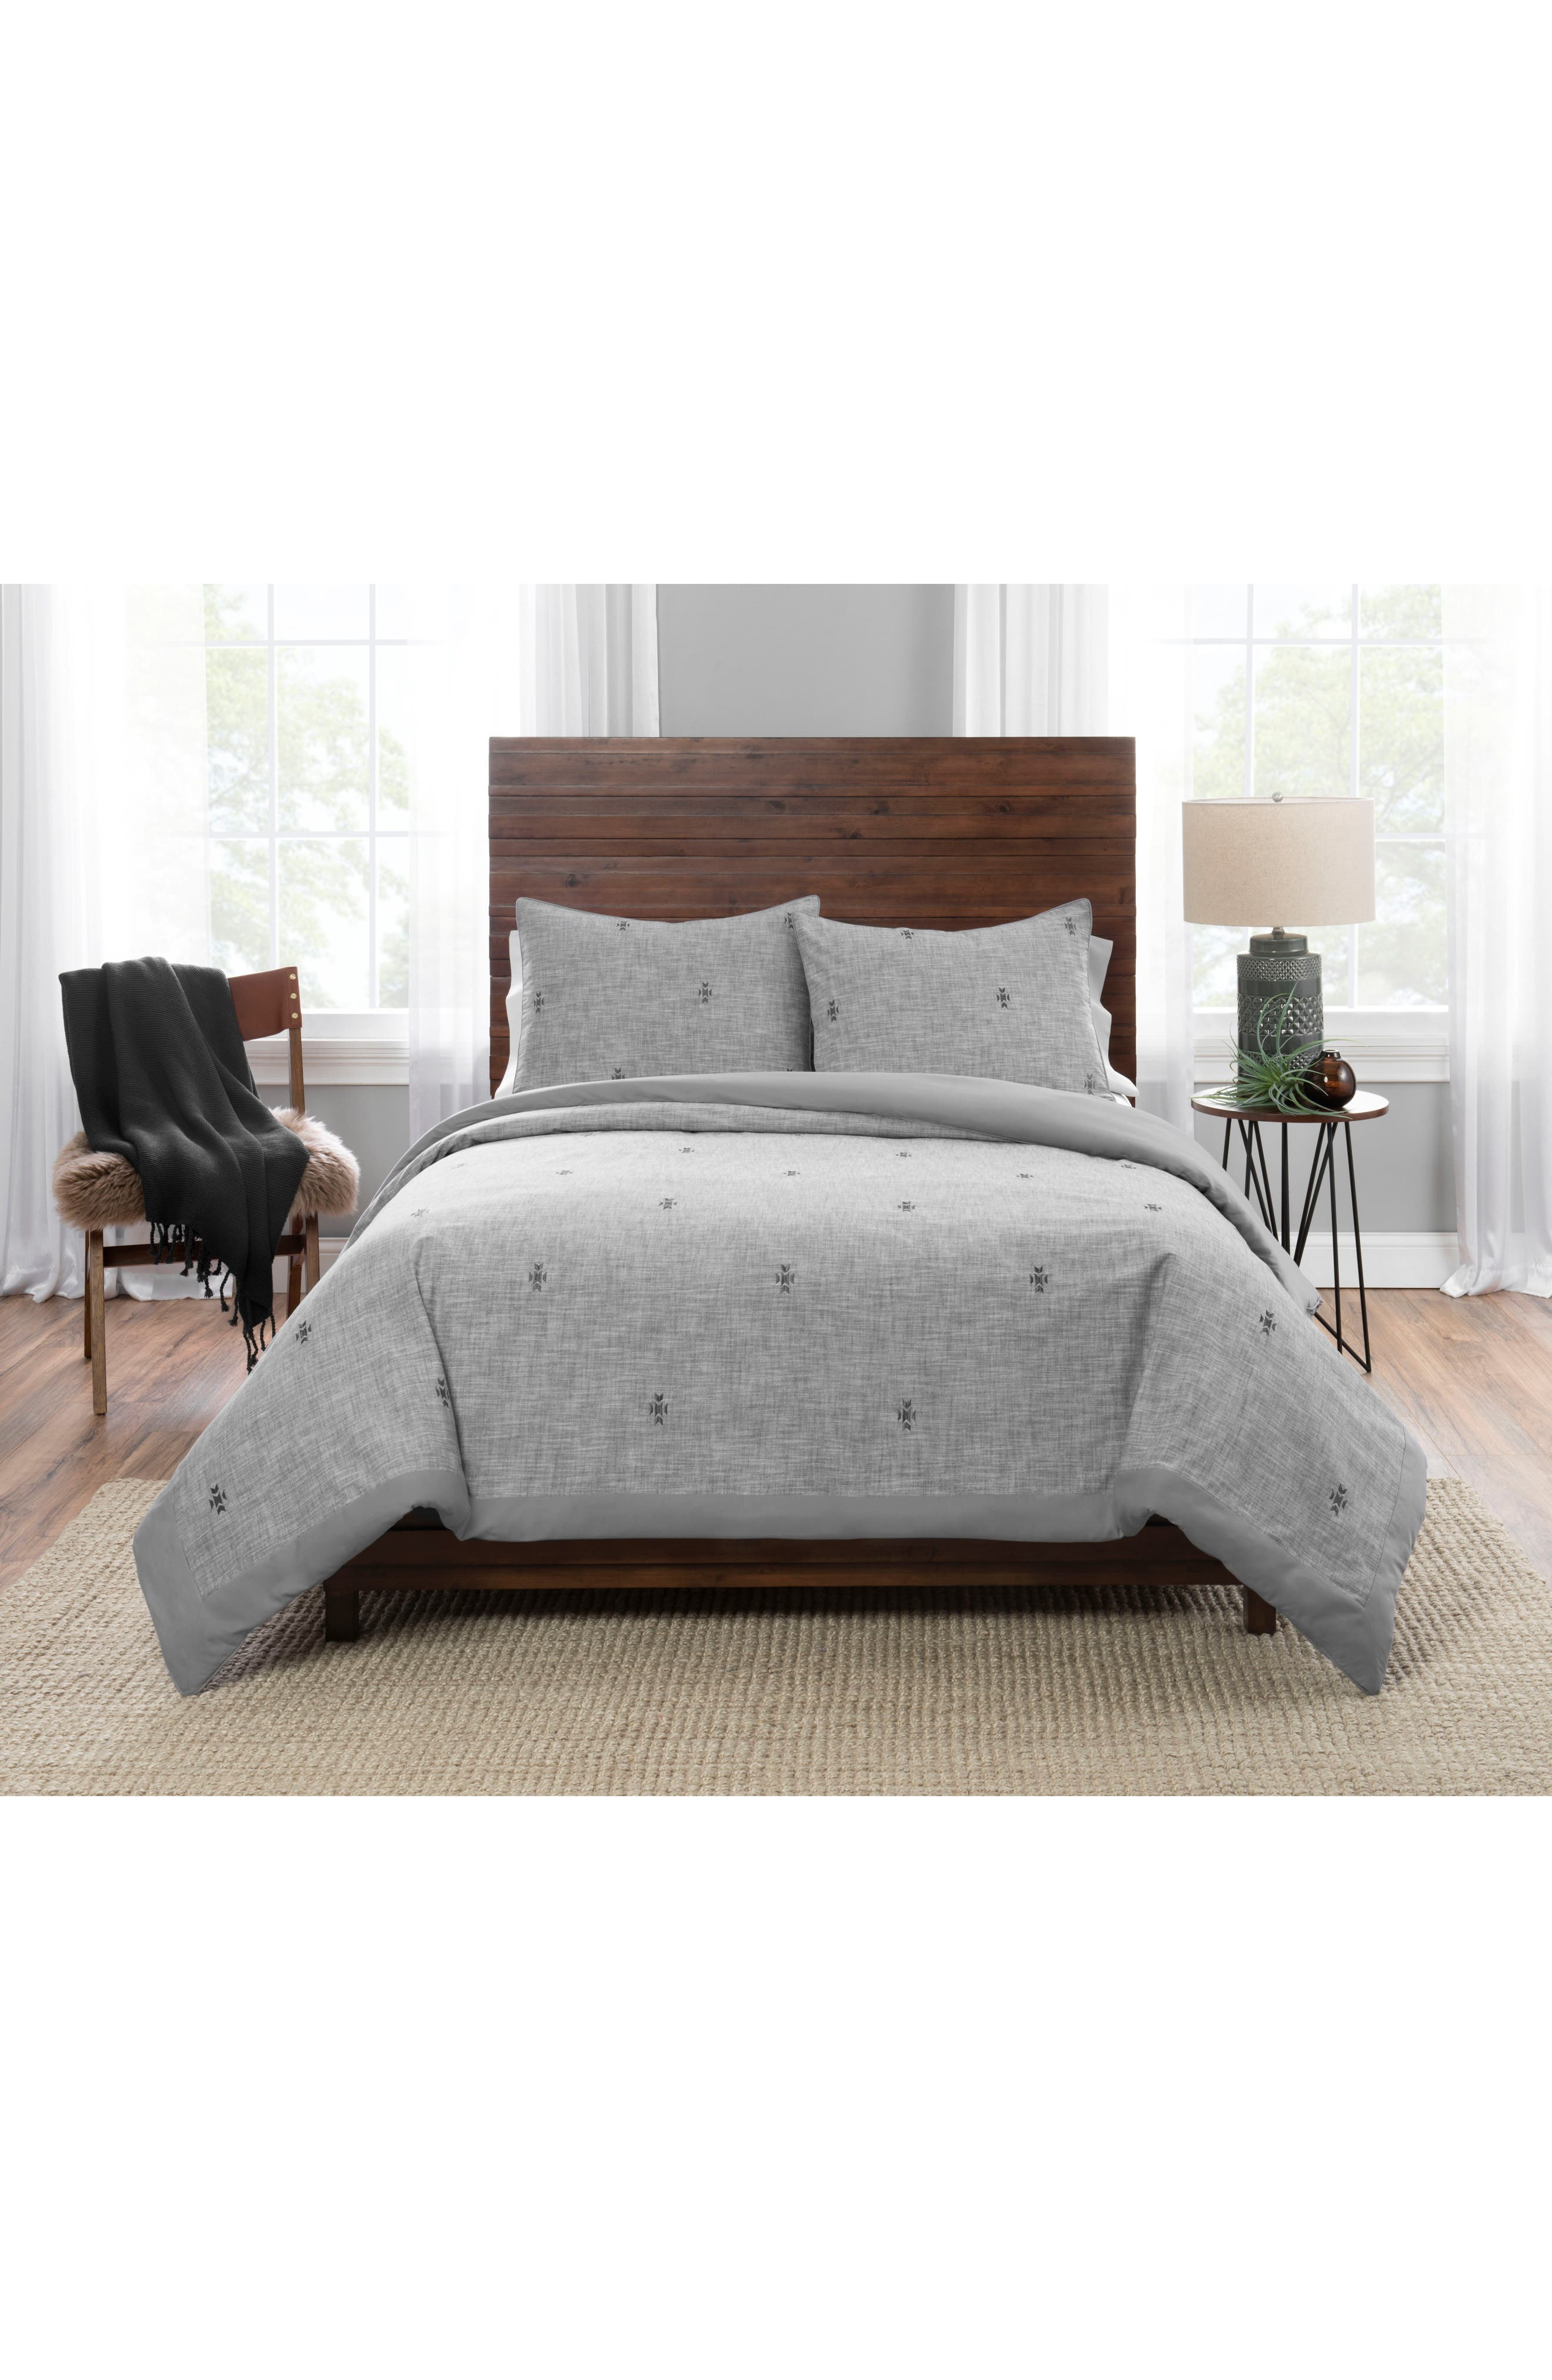 Alternate Image 1 Selected - Pendleton Sedona Geo Comforter & Sham Set